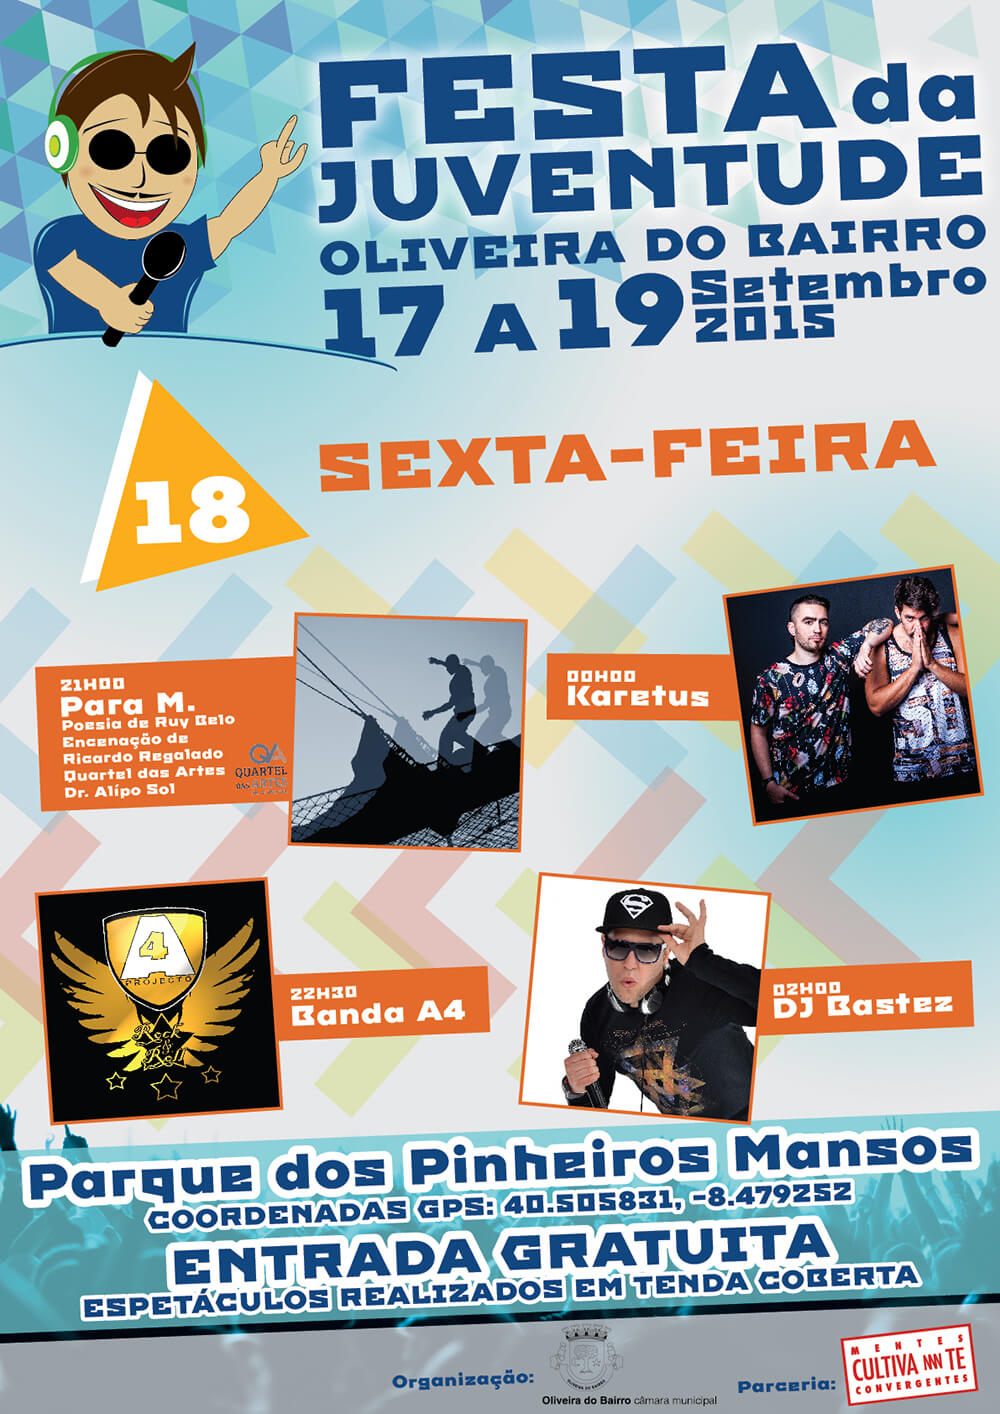 Festa da Juventude de Oliveira do Bairro - Poster for the 18th day | Way2Start - Design & Digital Agency